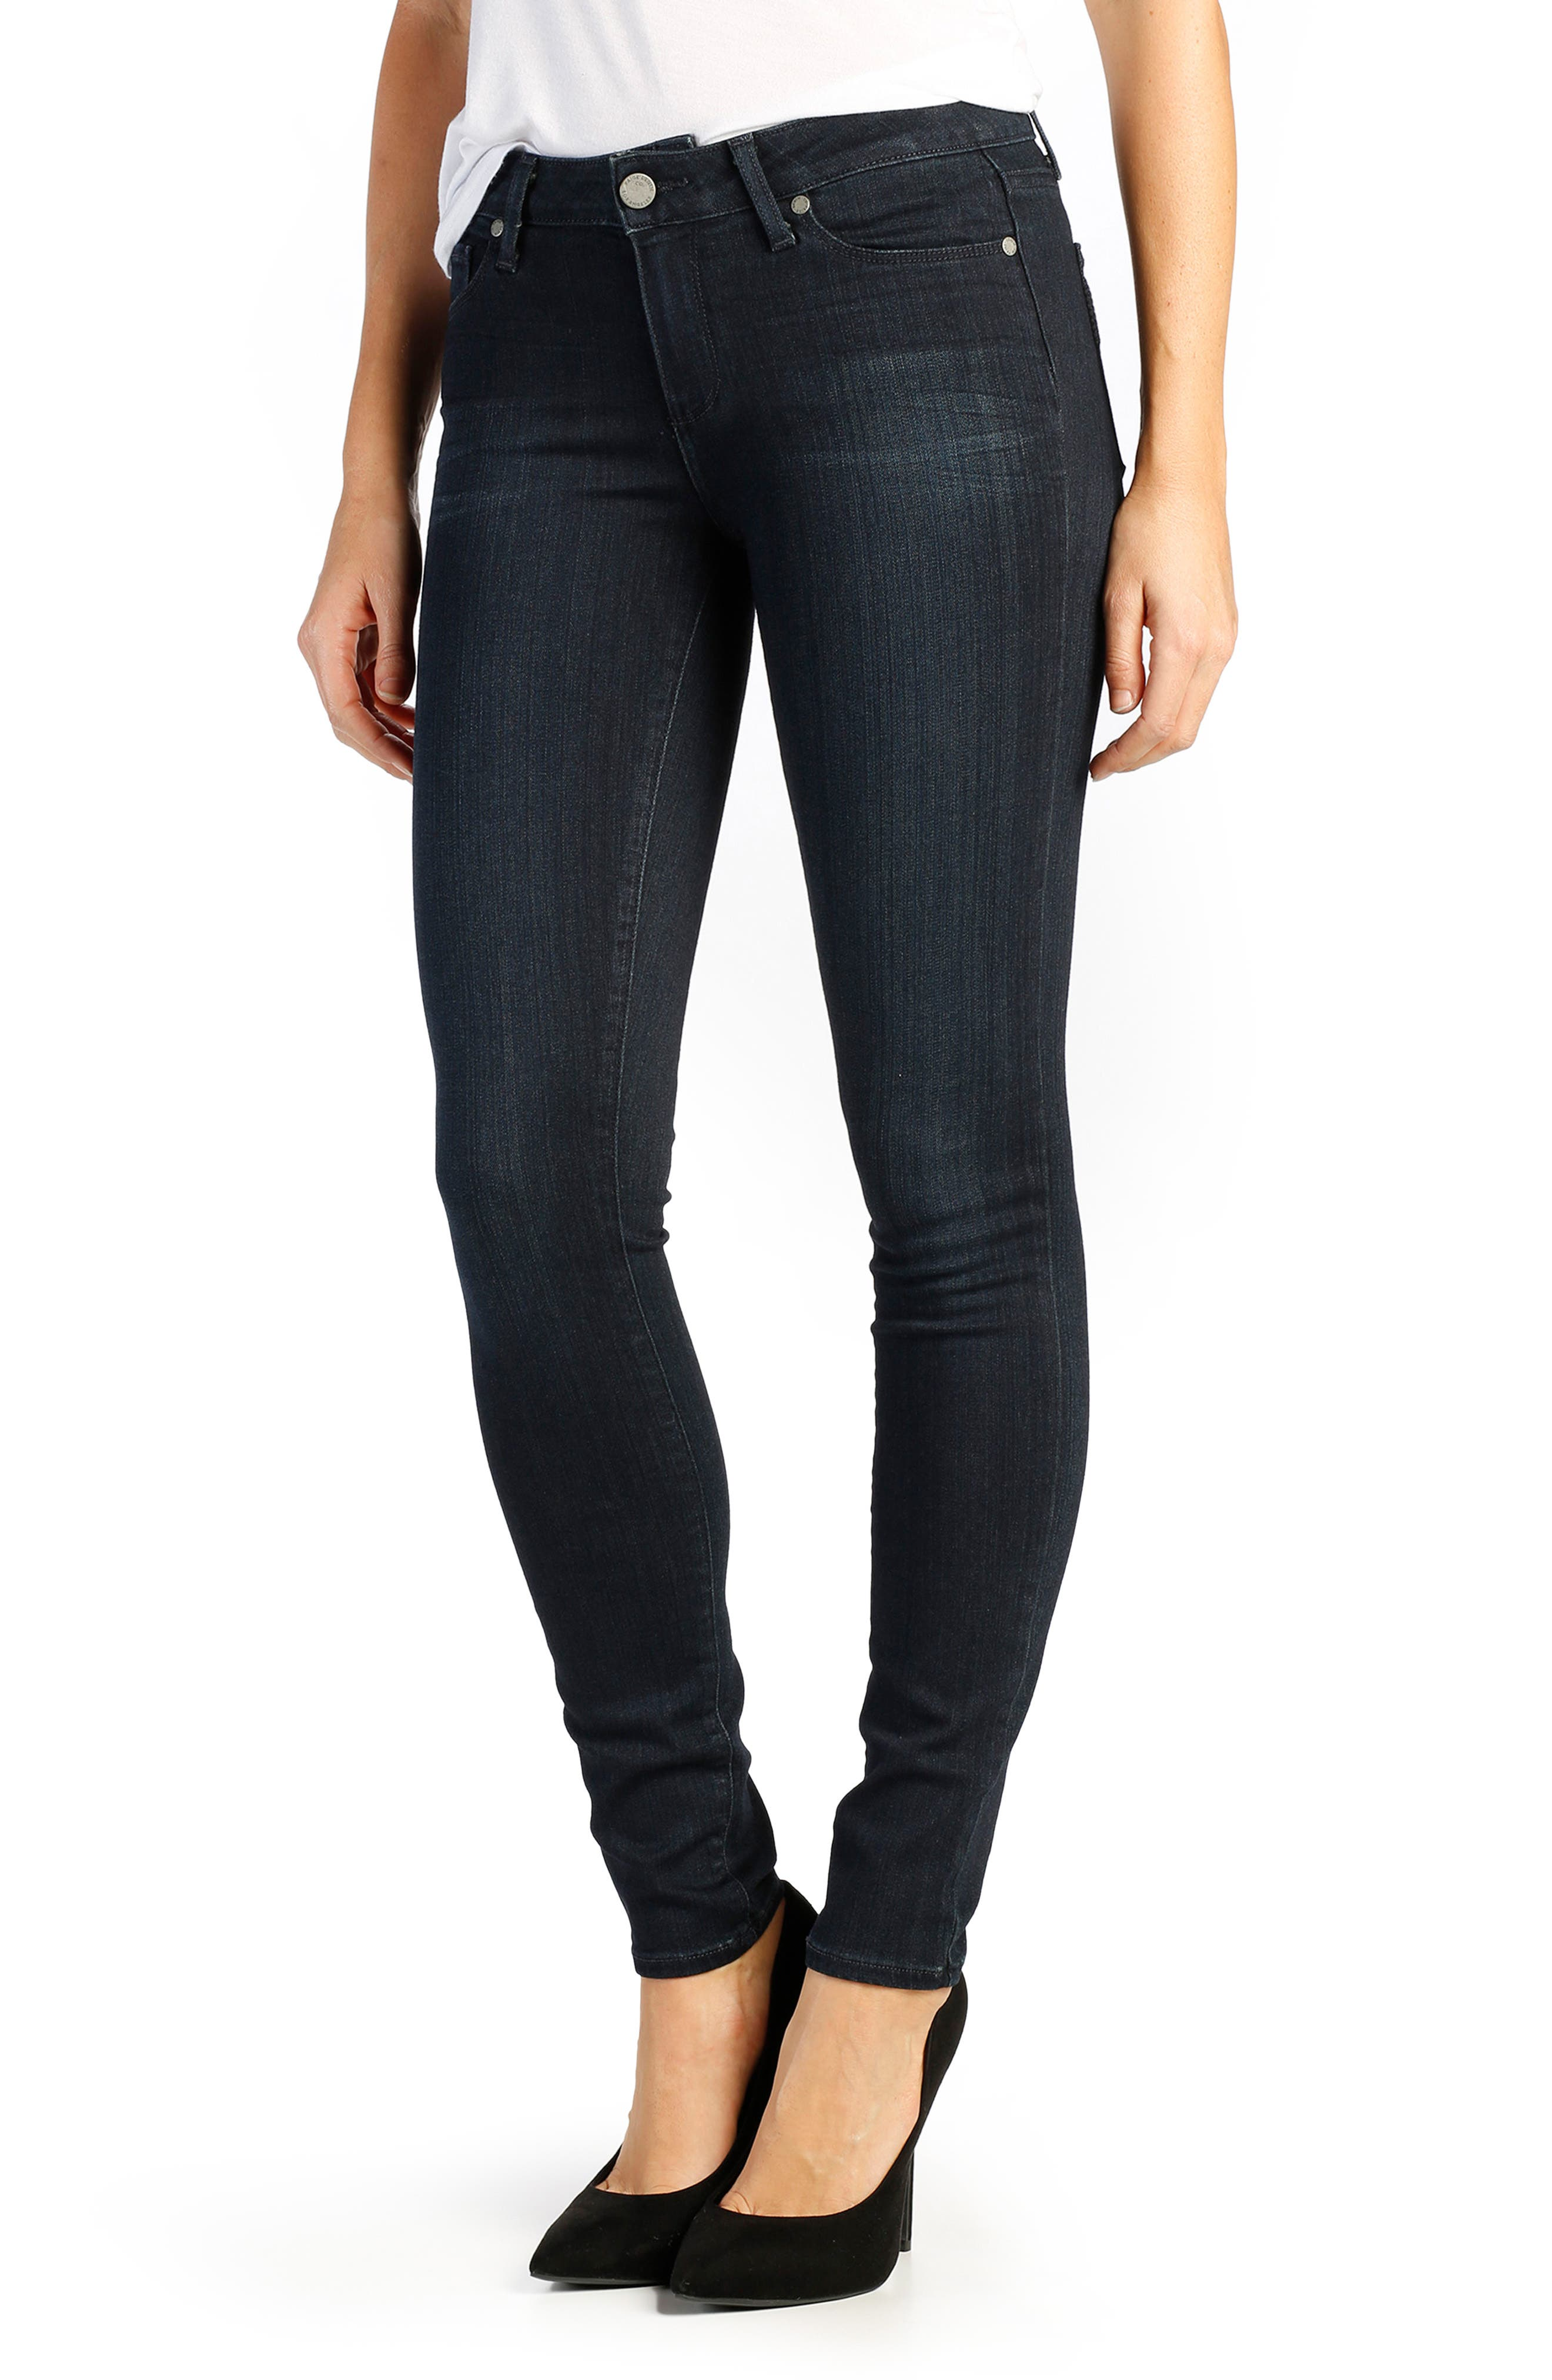 Main Image - PAIGE Transcend - Verdugo Ultra Skinny Jeans (Total Mona)